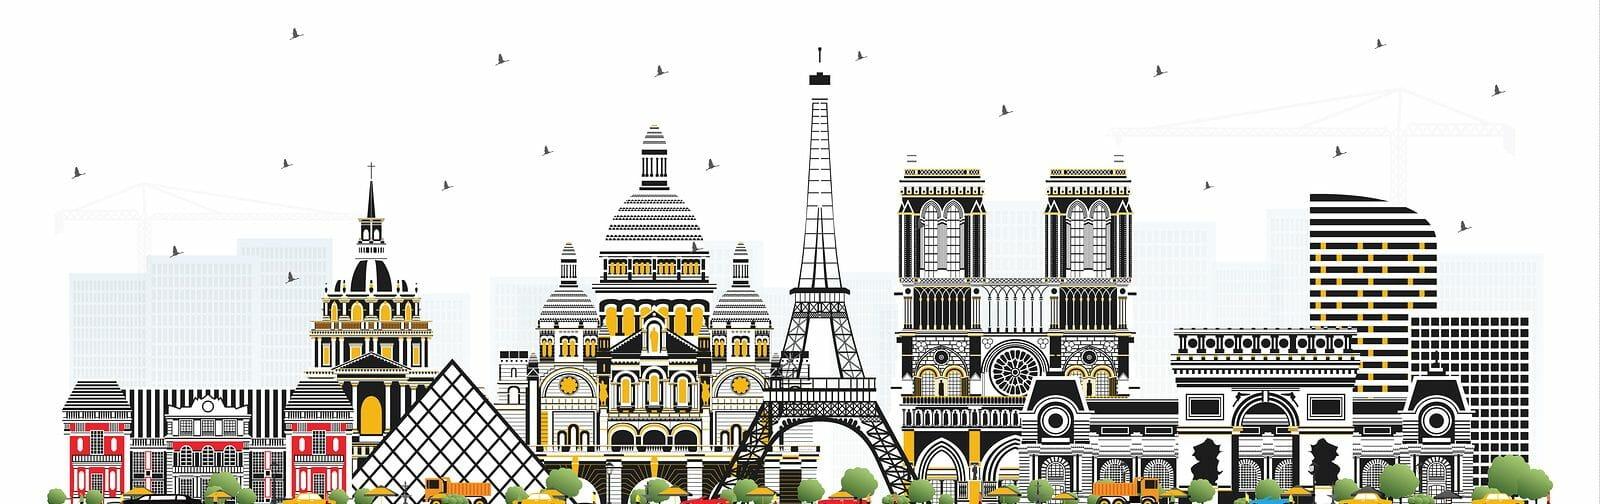 ESCRS Paris